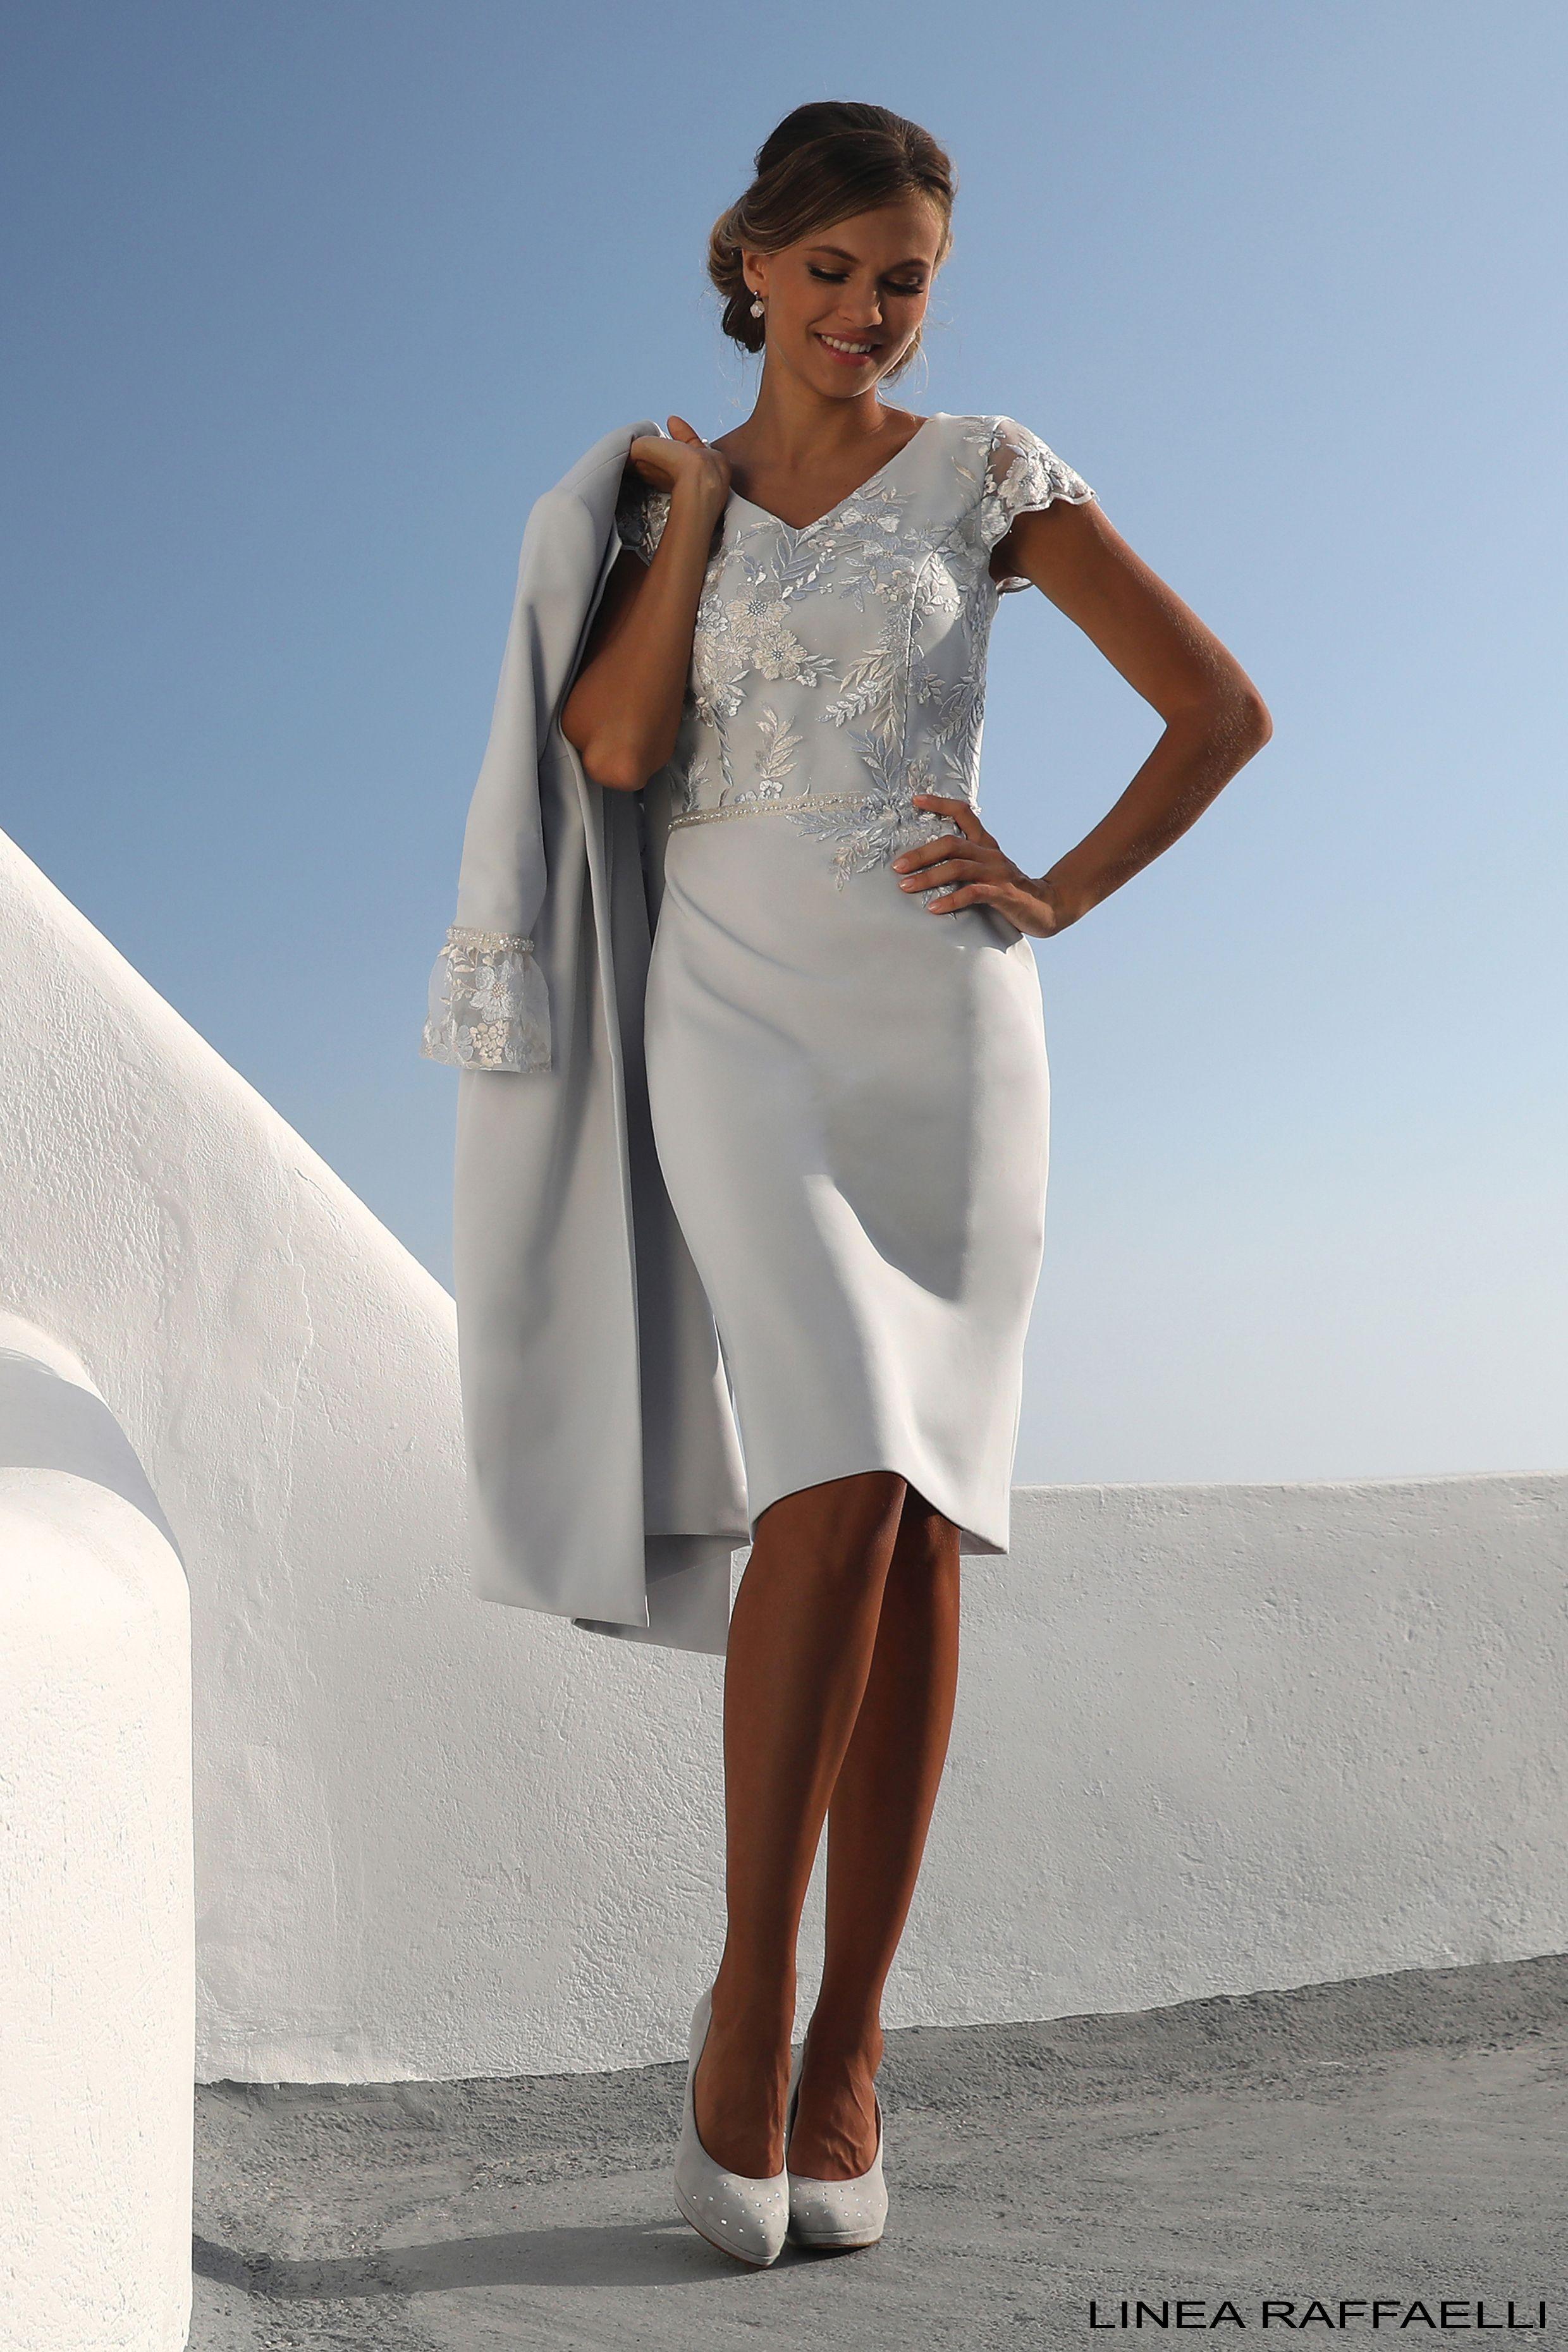 0fe78ca49172f5 Linea Raffaelli Santorini S19 collection Set 70 | Silver grey coat &  matching dress with lace